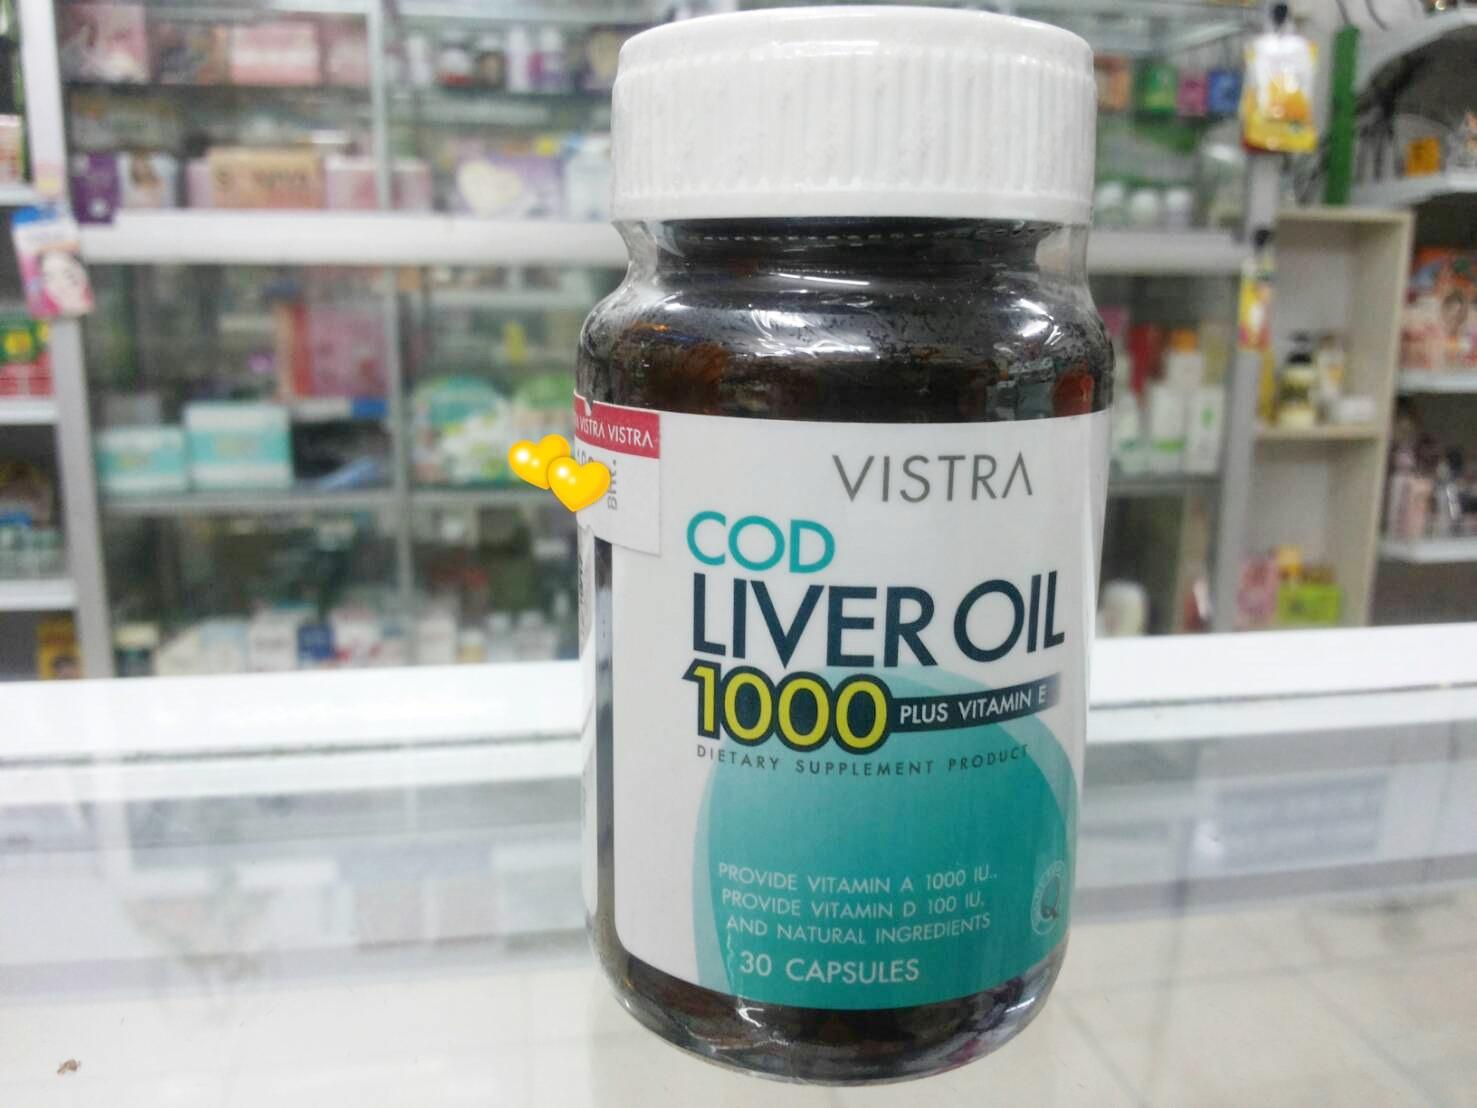 Vistra Cod Liver Oil 1000 mg plus Vitamin E ราคา ส่งถูก